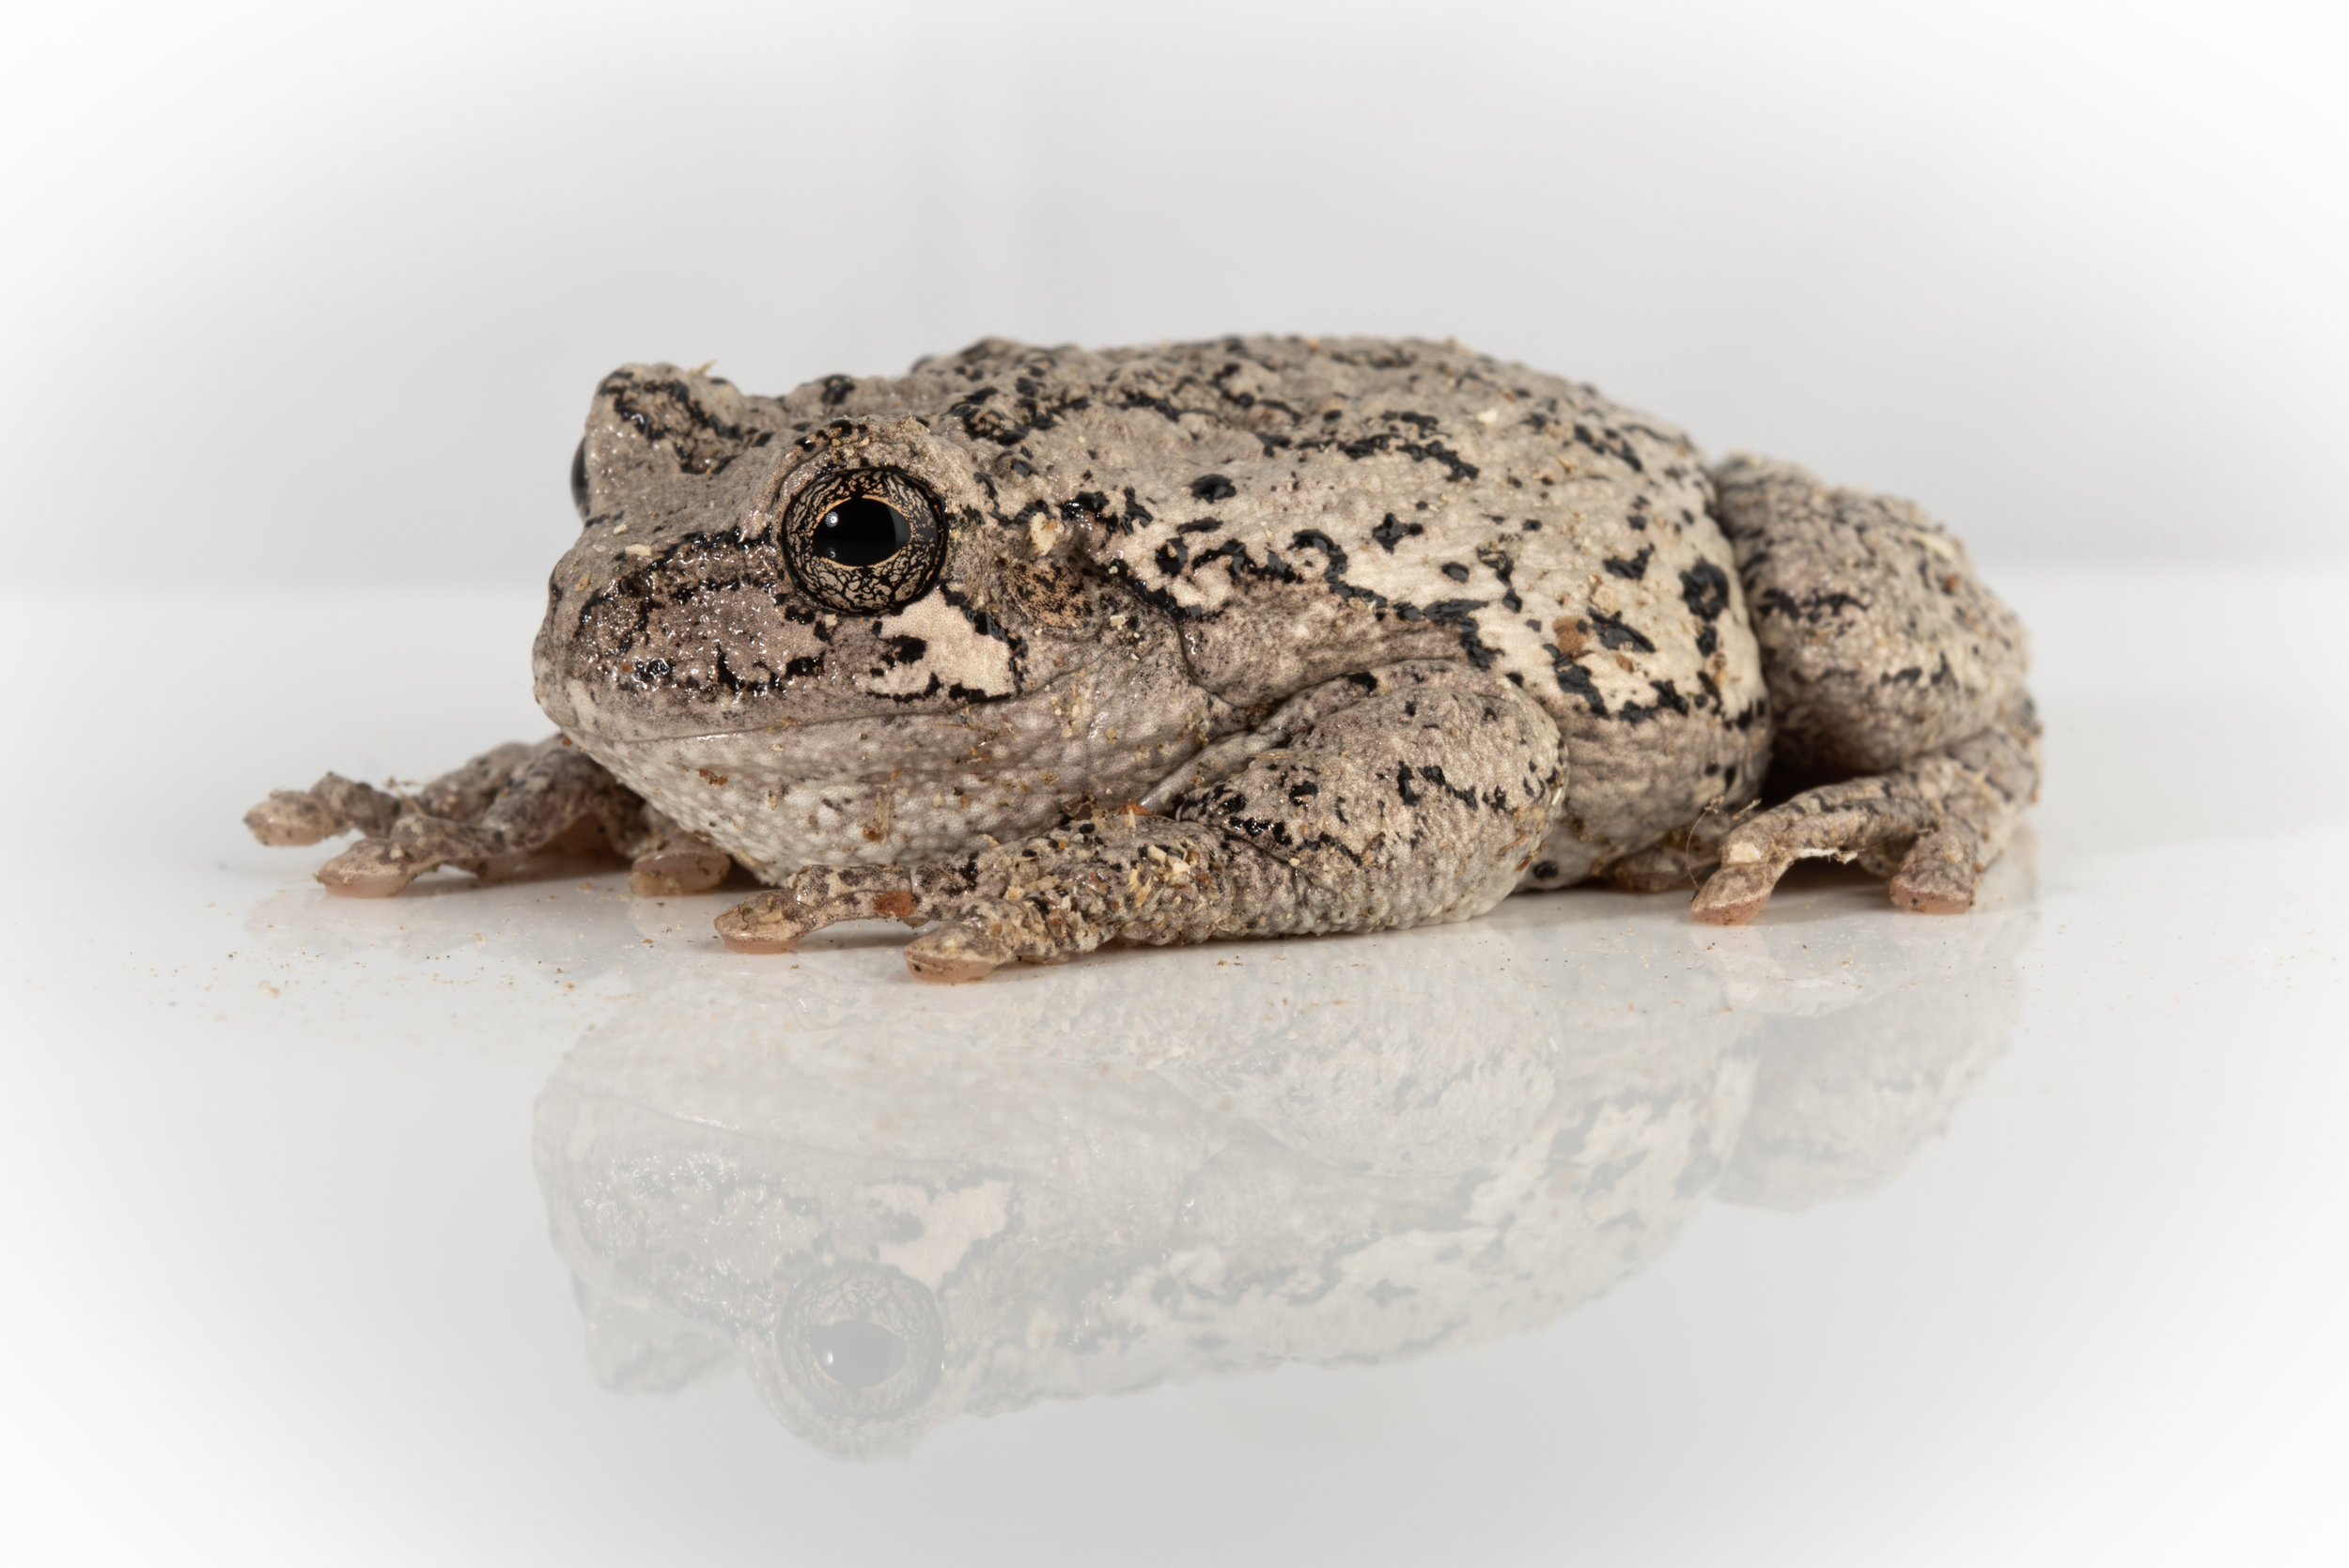 Eastern Gray Treefrog (Hyla versicolor)